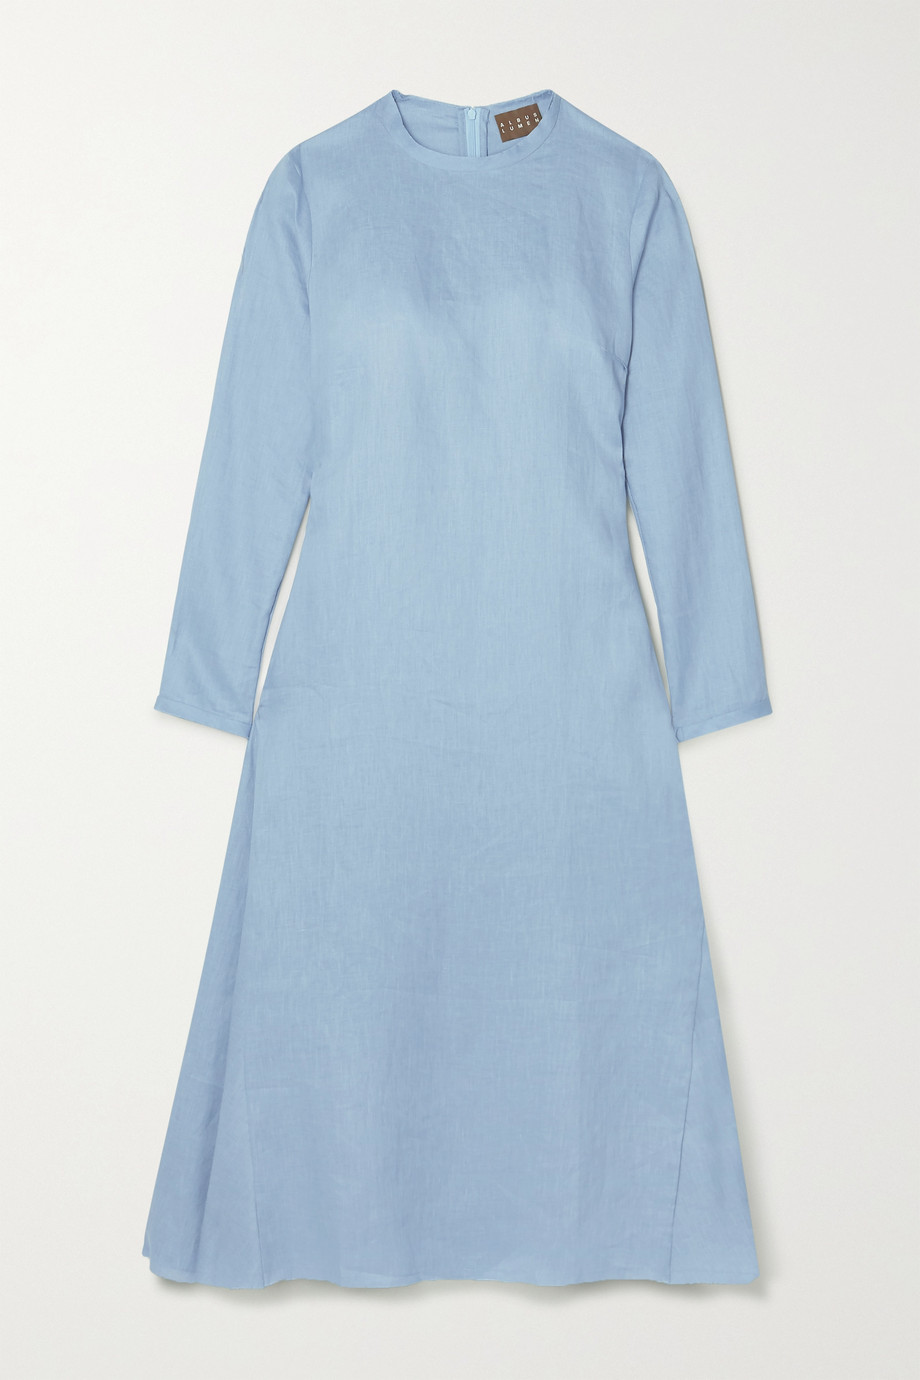 Albus Lumen | Tula linen maxi dress | NET-A-PORTER.COM